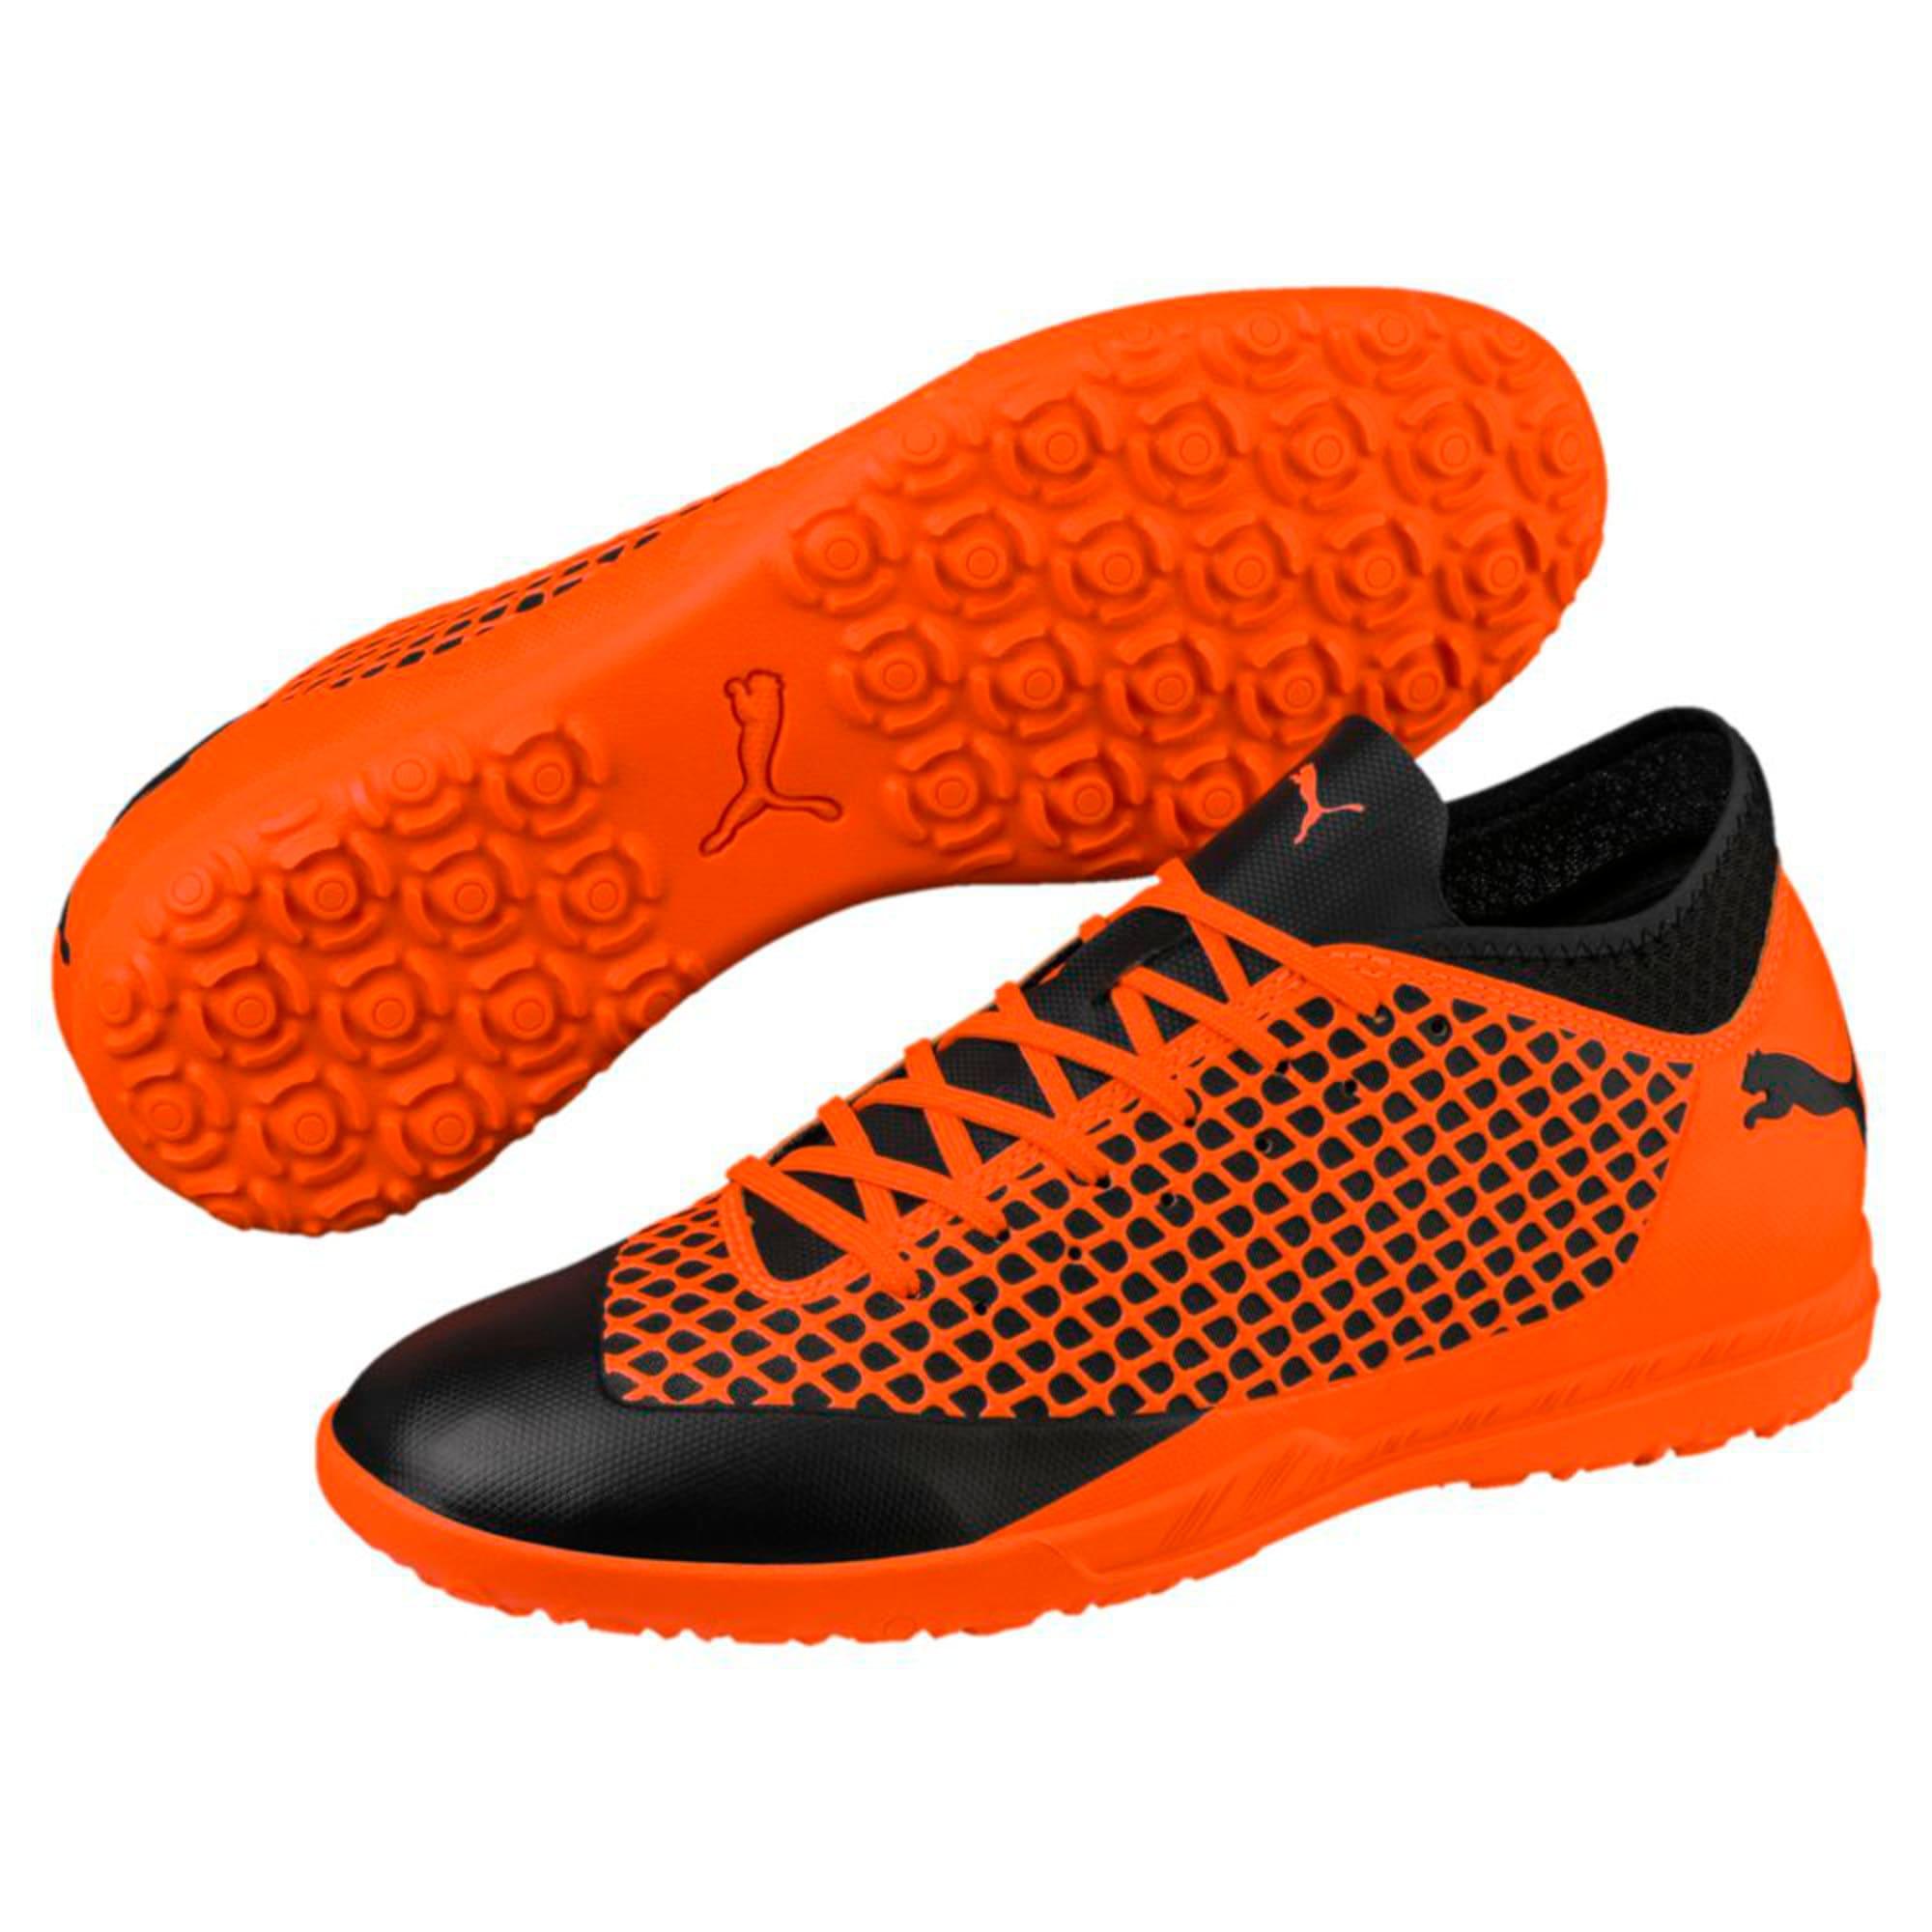 Thumbnail 6 of FUTURE 2.4 TT Men's Football Boots, Puma Black-Shocking Orange, medium-IND